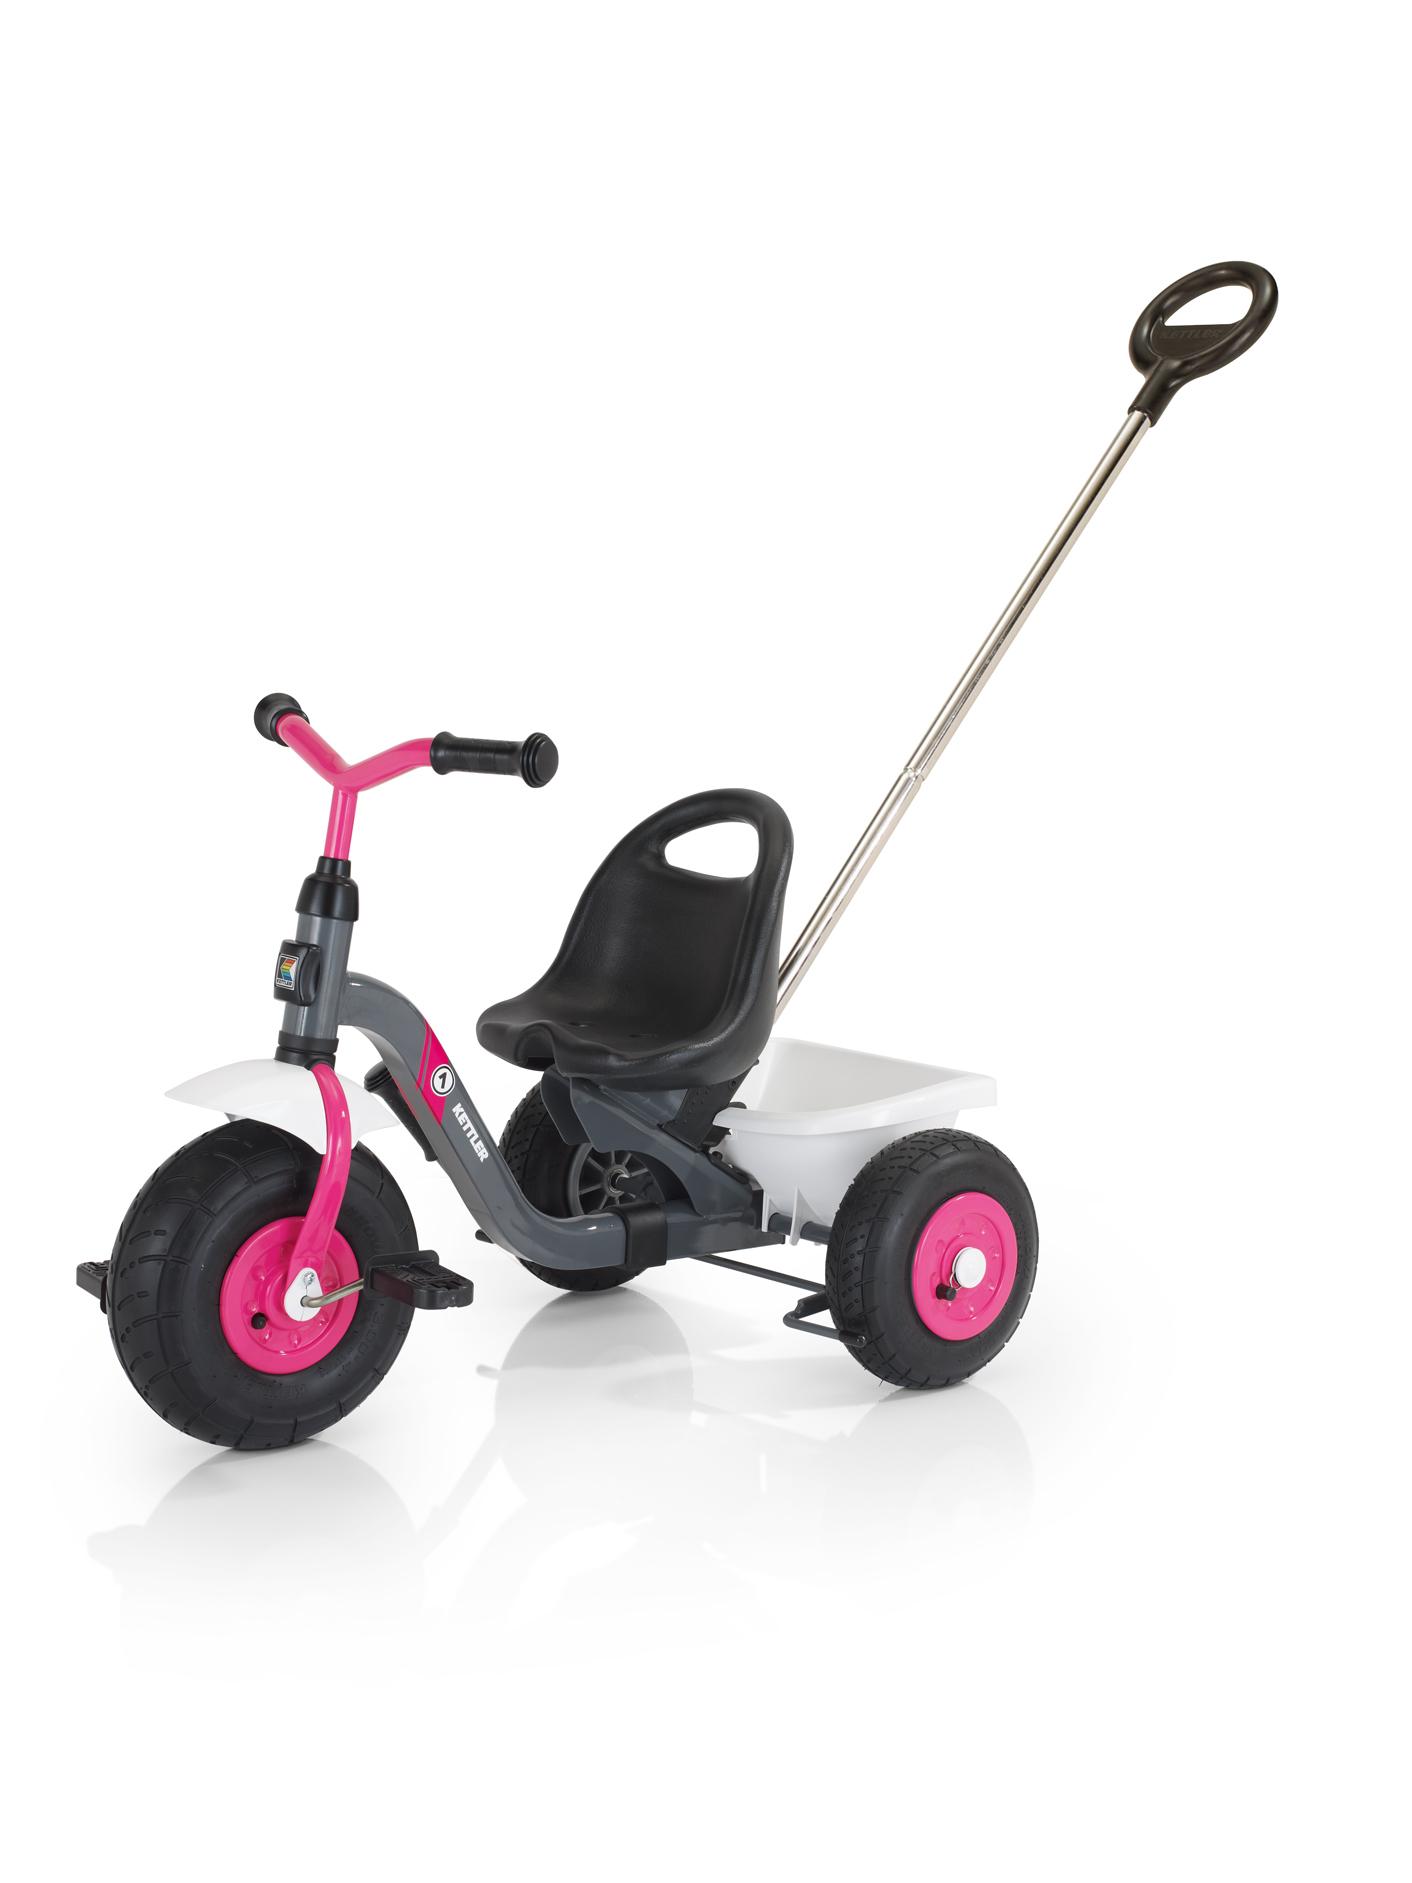 xml-tricikel-kettler-toptrike-air-girl-5